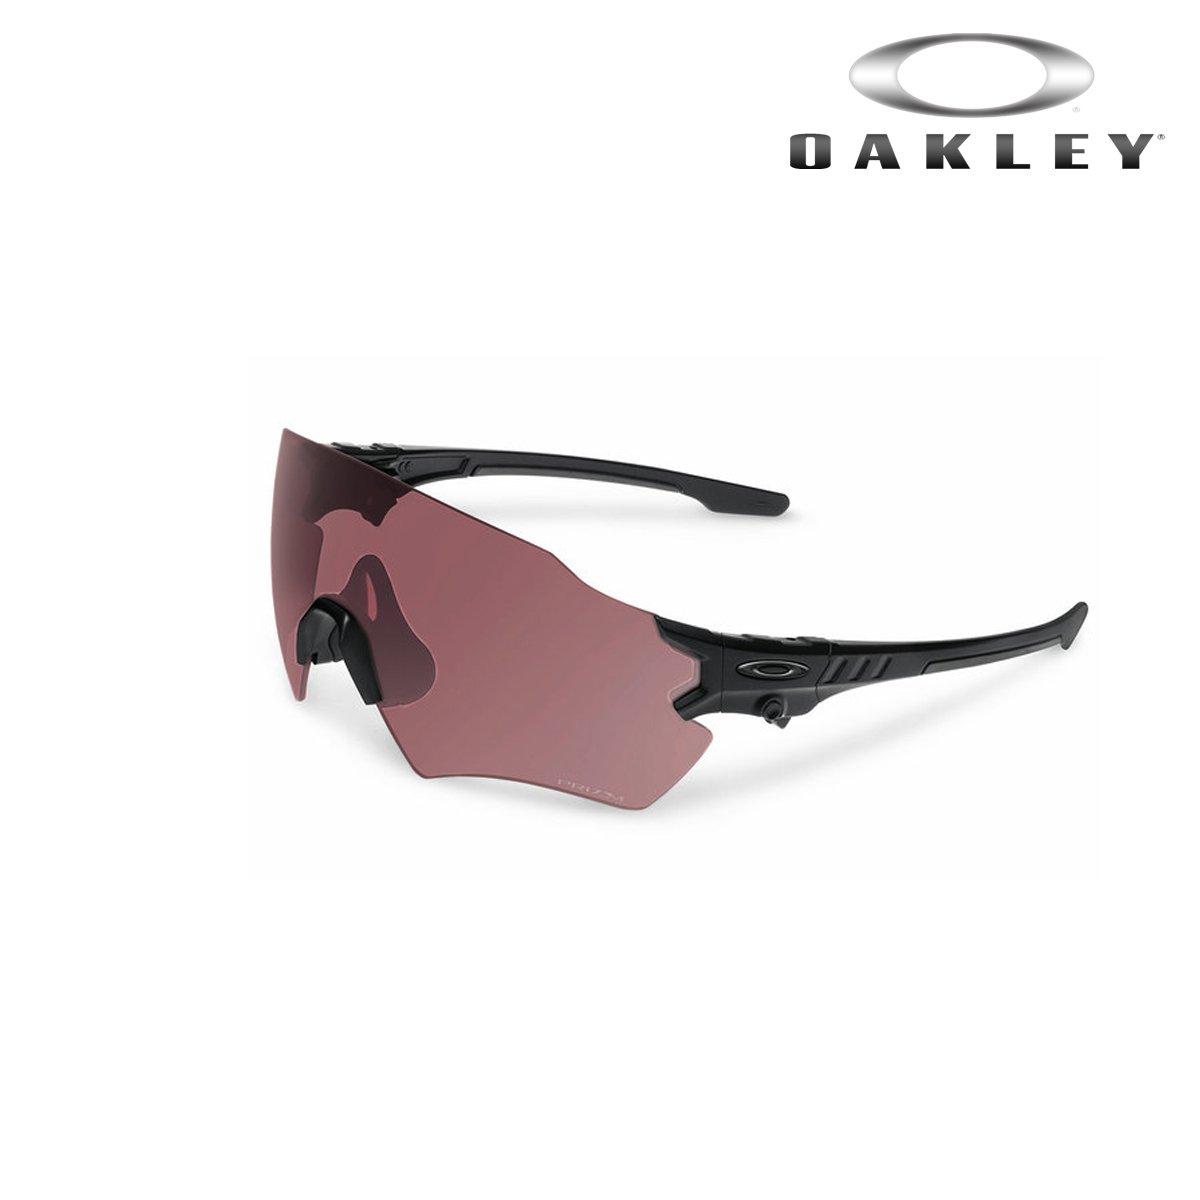 Lunette Oakley Protection Balistique argoat web fr. Lunette Oakley  Protection. Lunette SI Tombstone™ Reap Prizm™ TR22 Oakley SI 4ac744e4f3b5